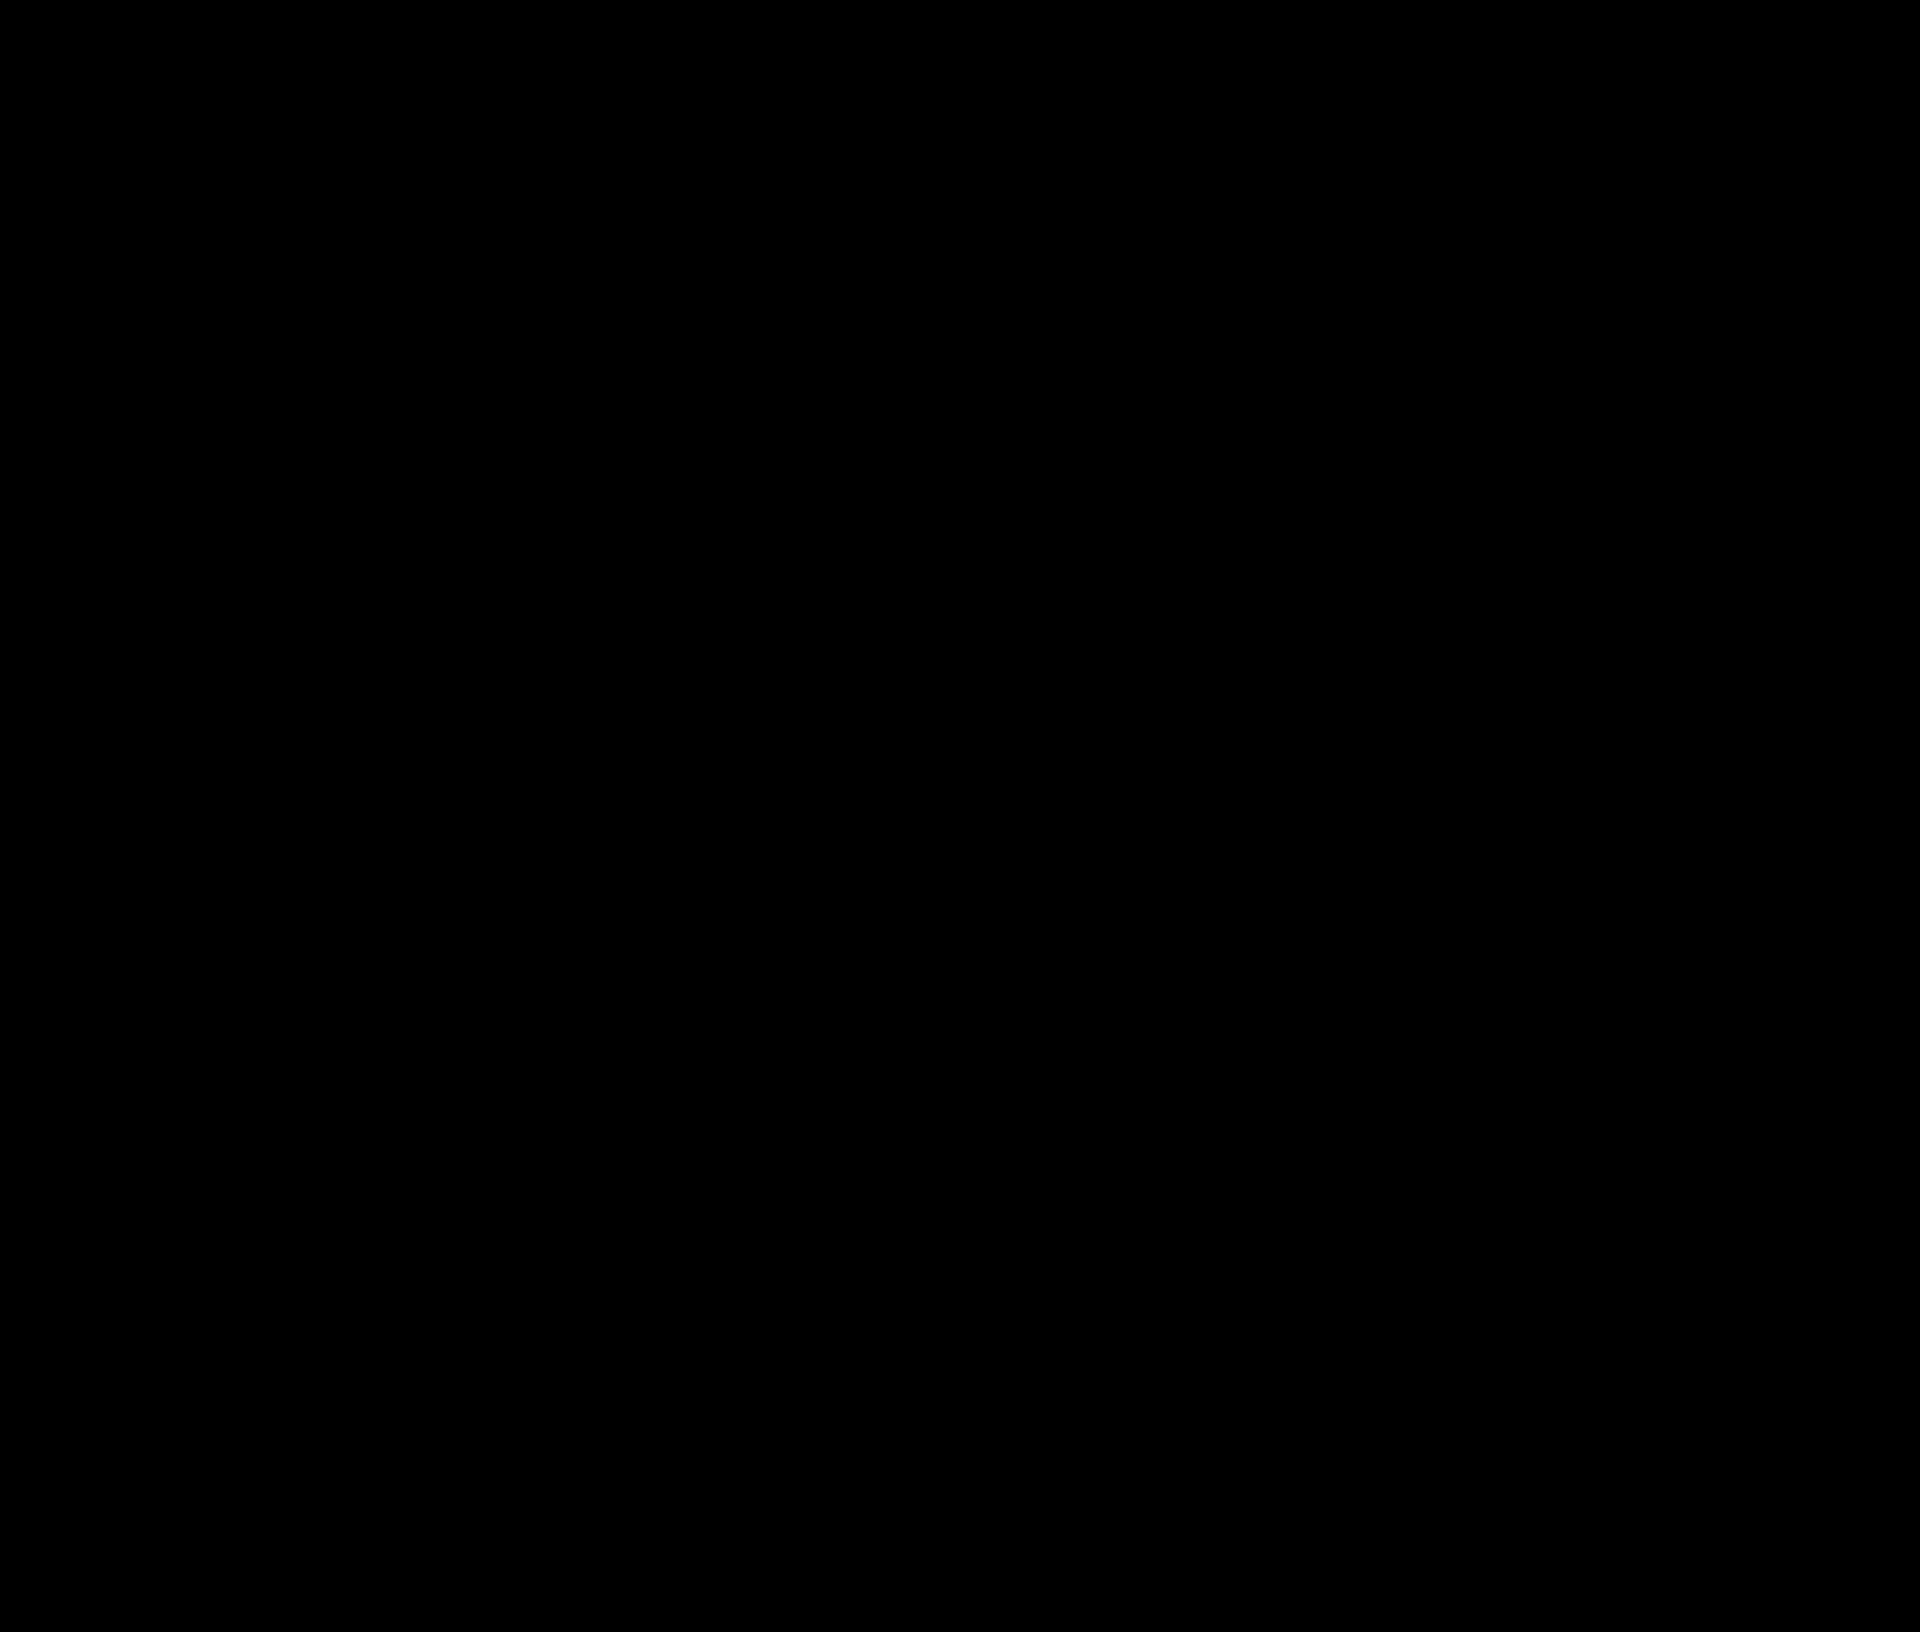 stikstof, nox en stikstofdioxiden